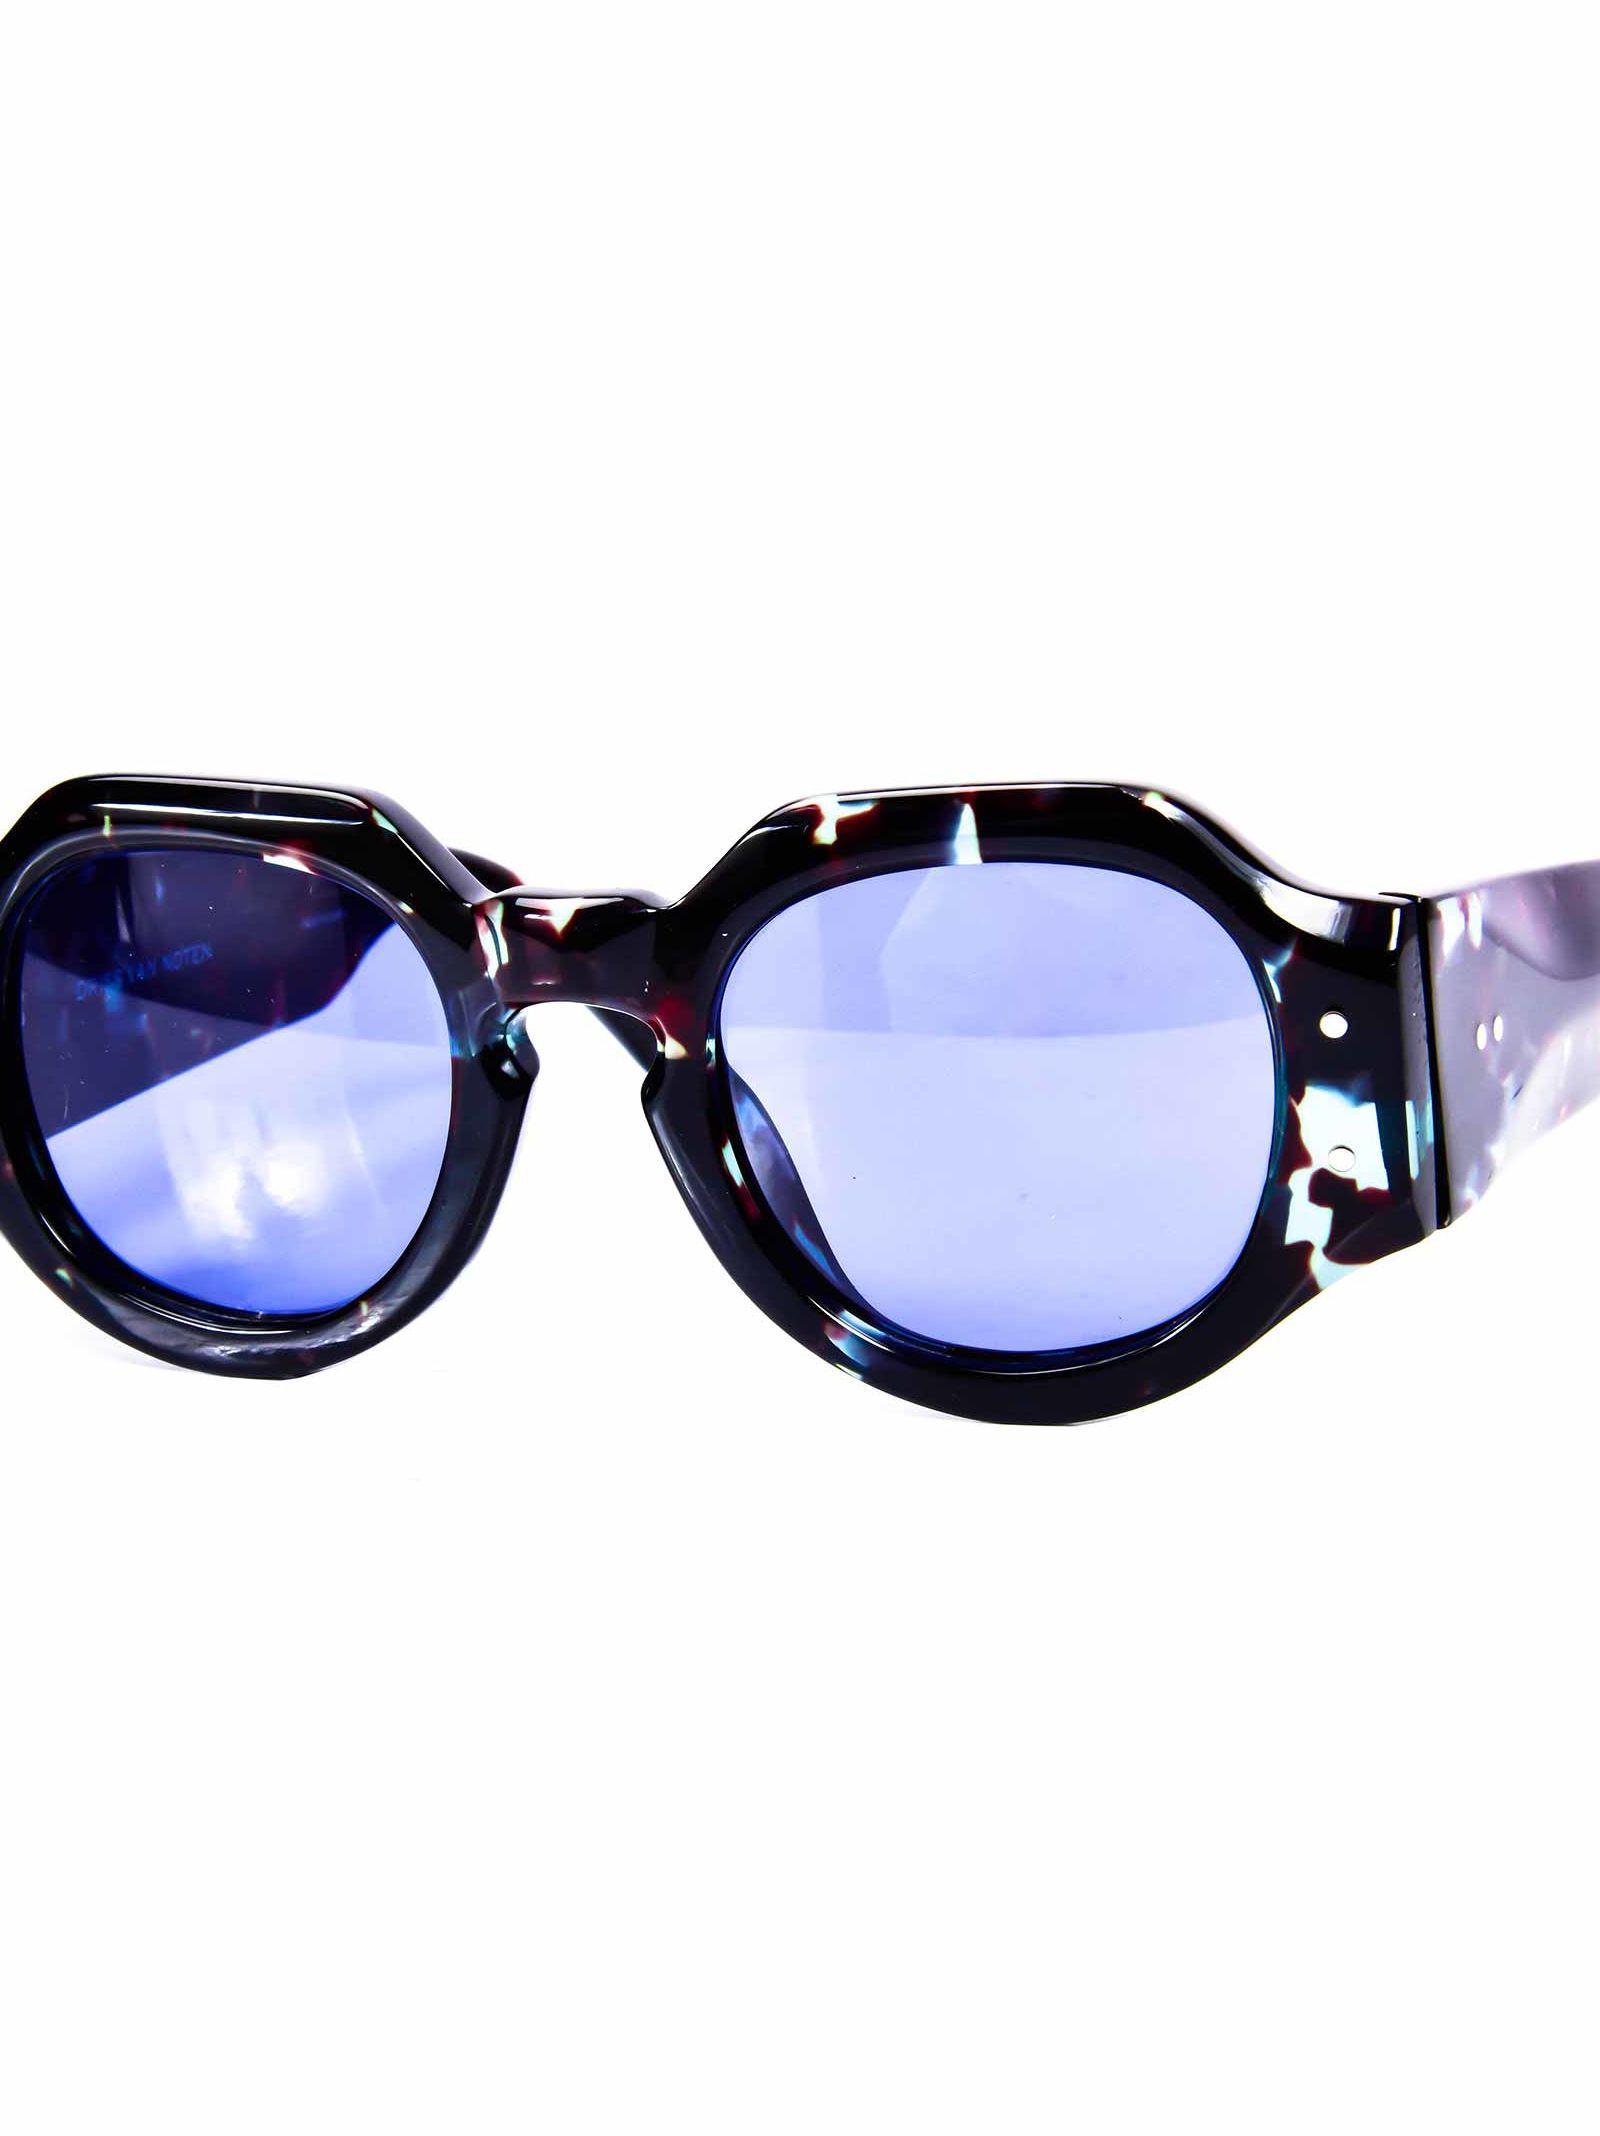 73d13e833e2e Linda Farrow Dries Van Noten Sunglasses In Cmulticolour